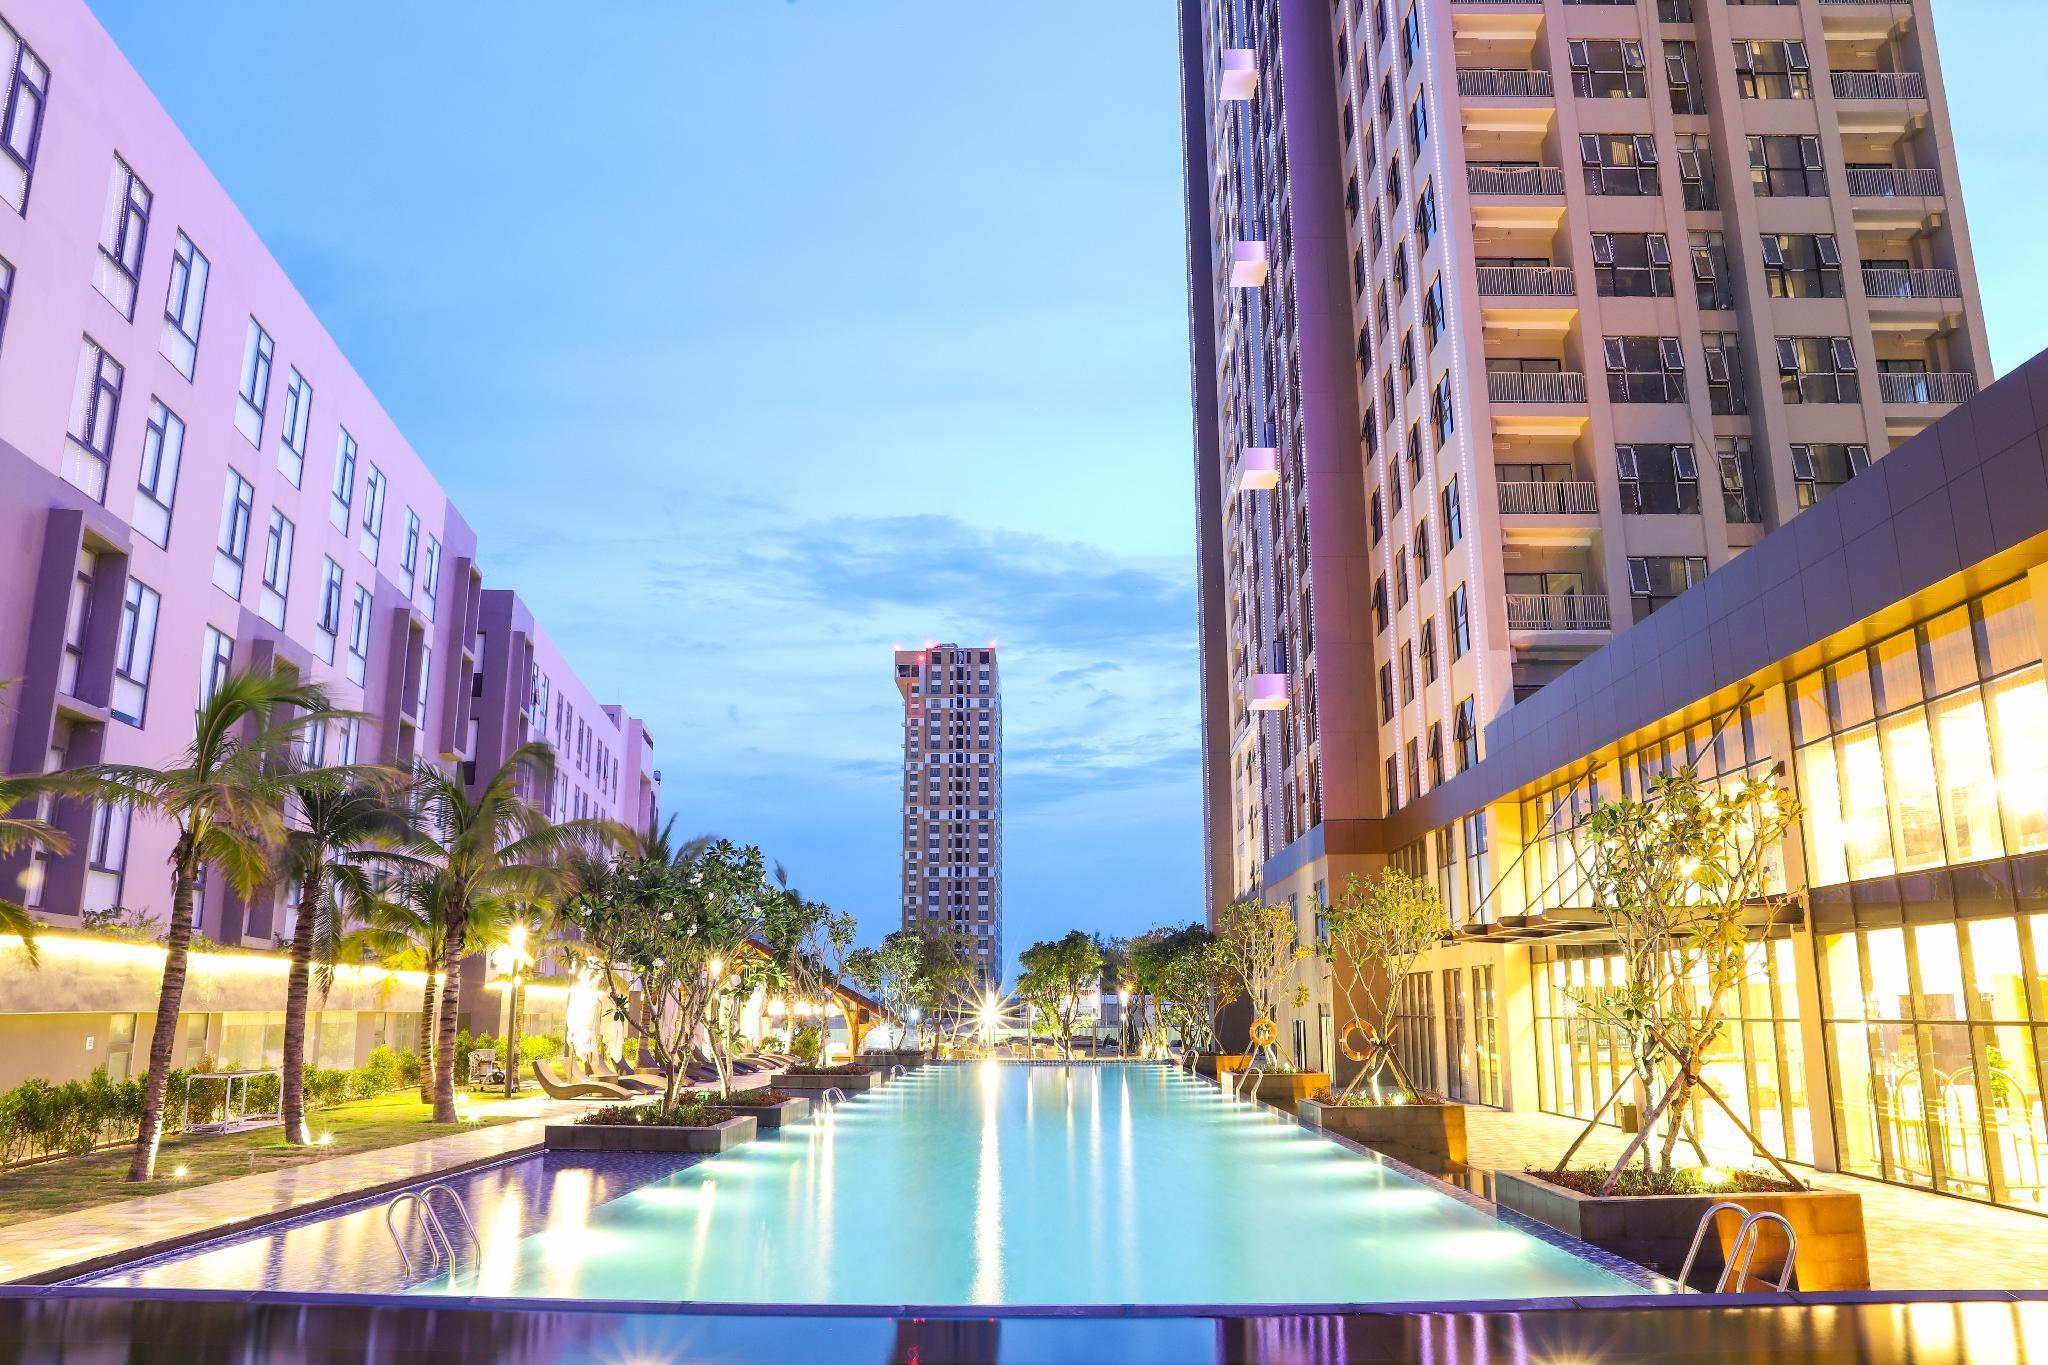 Carinae Hotel Cocobay Danang